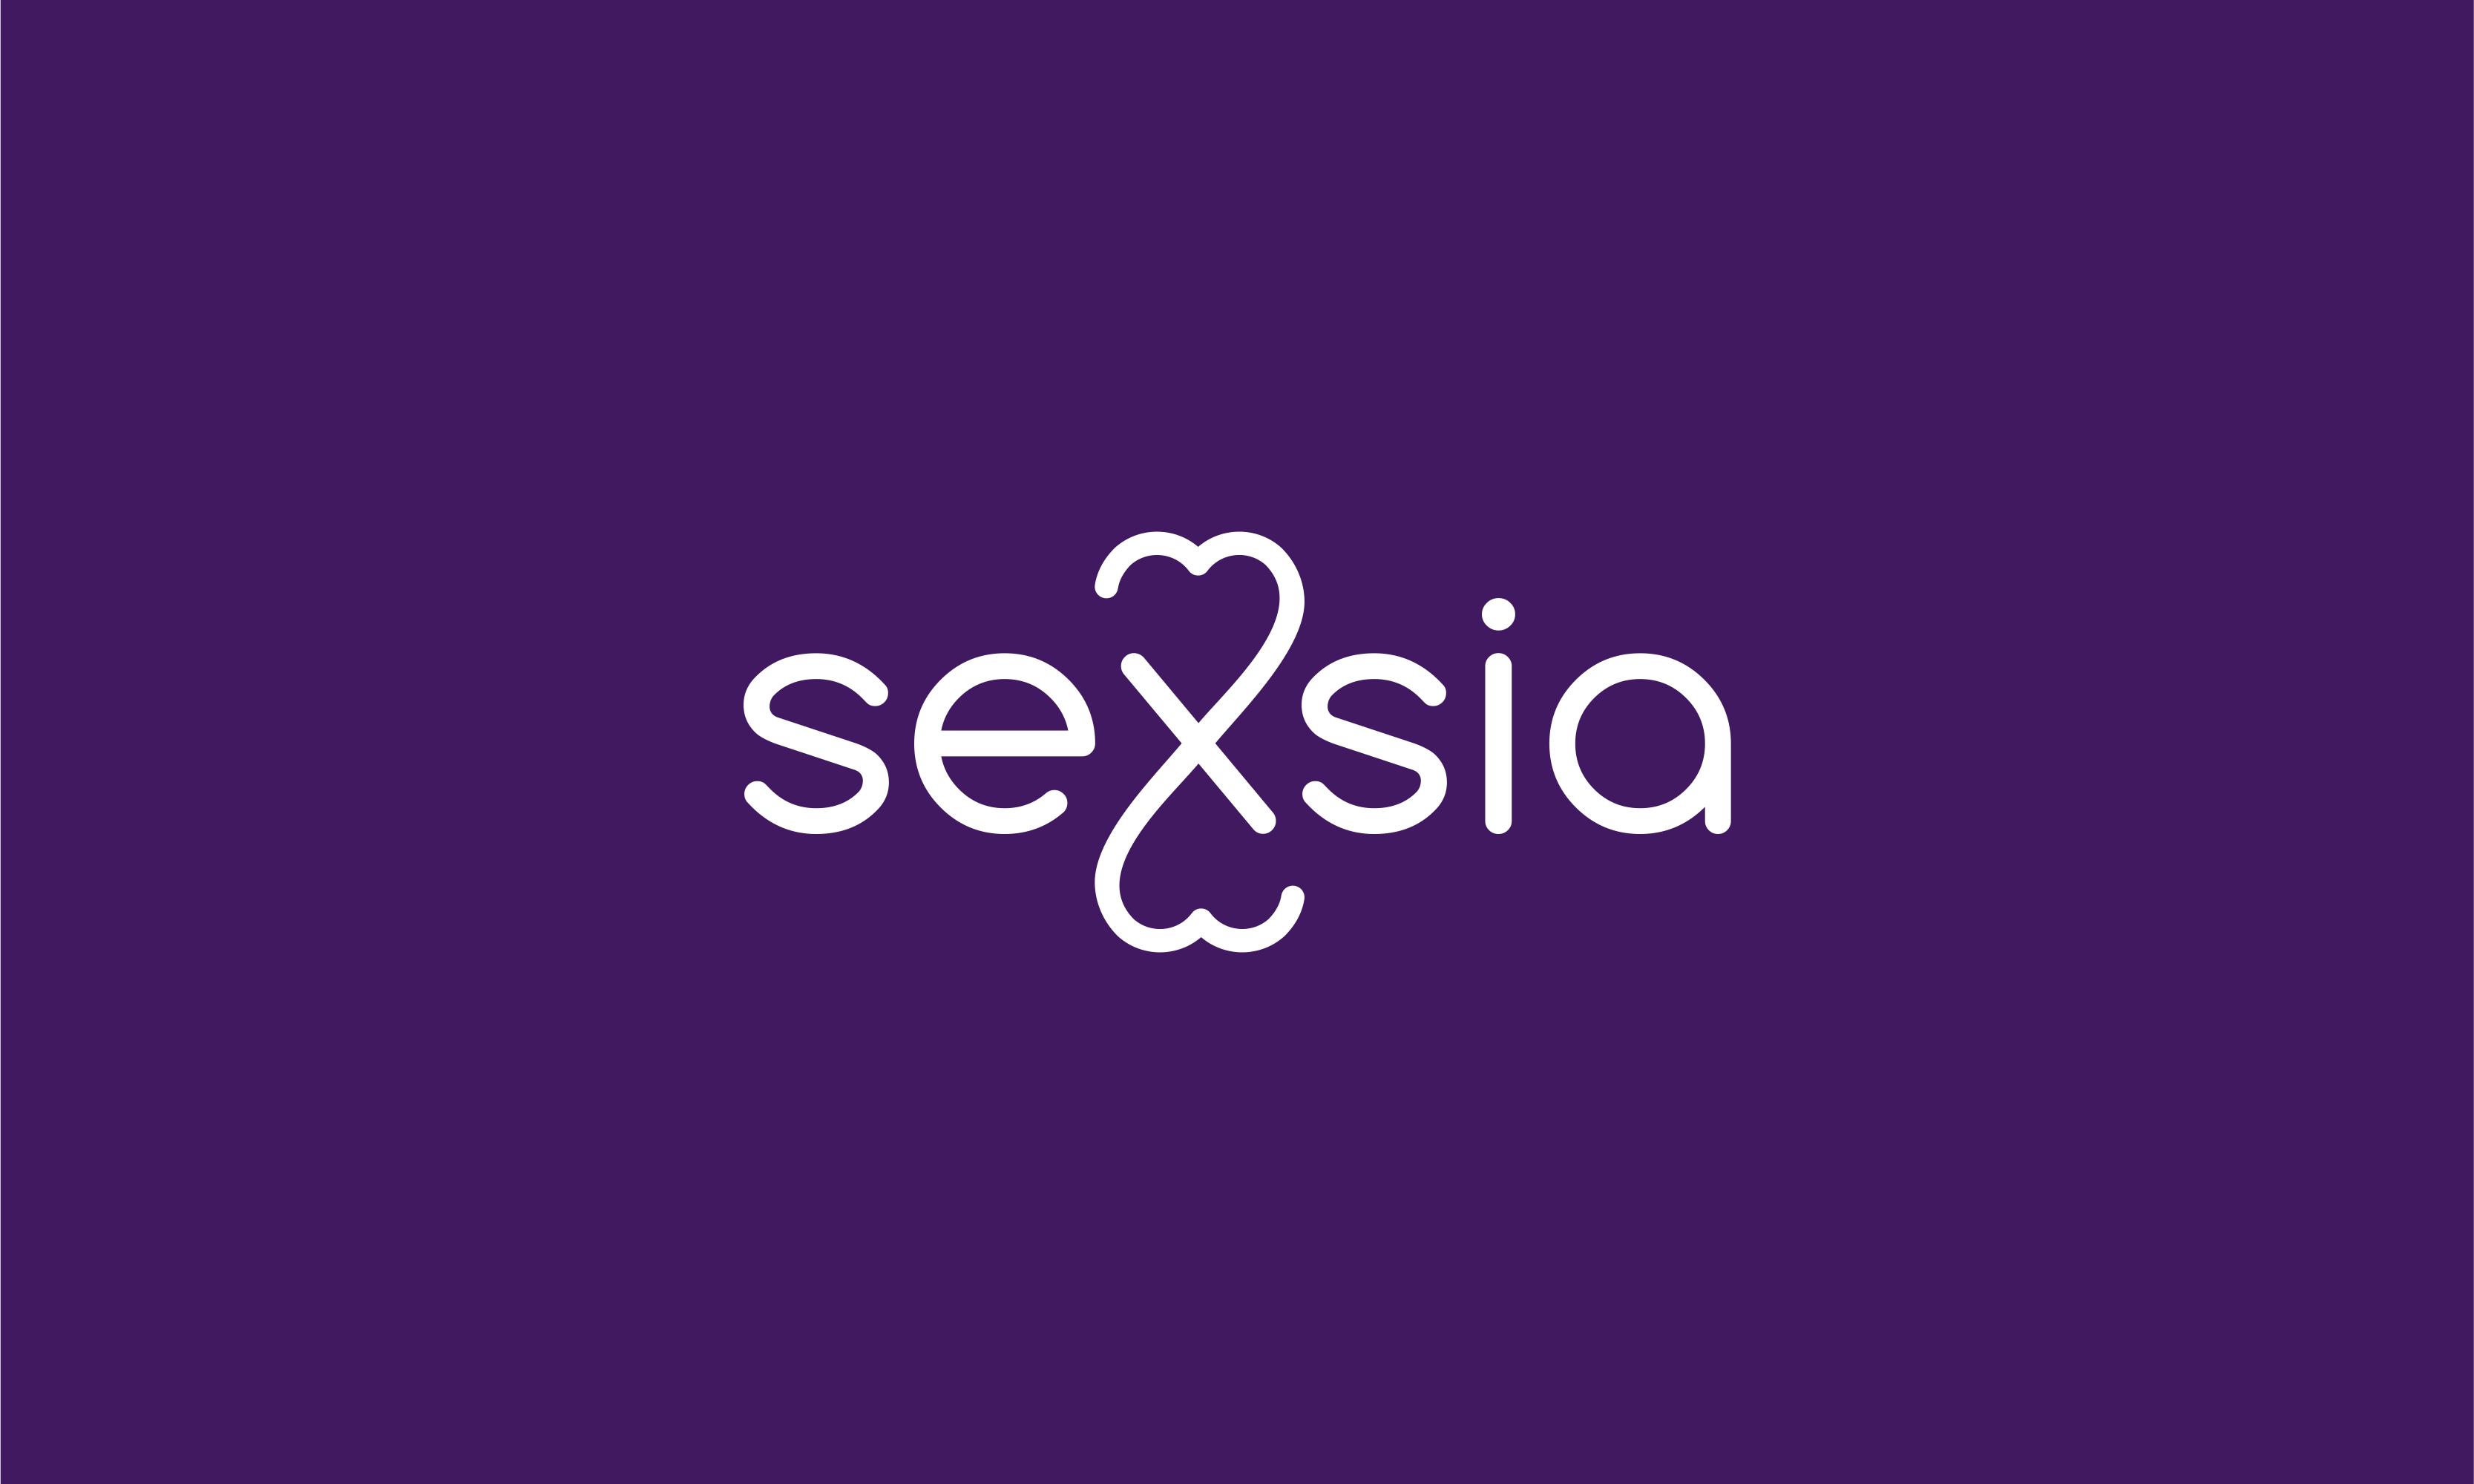 Sexsia